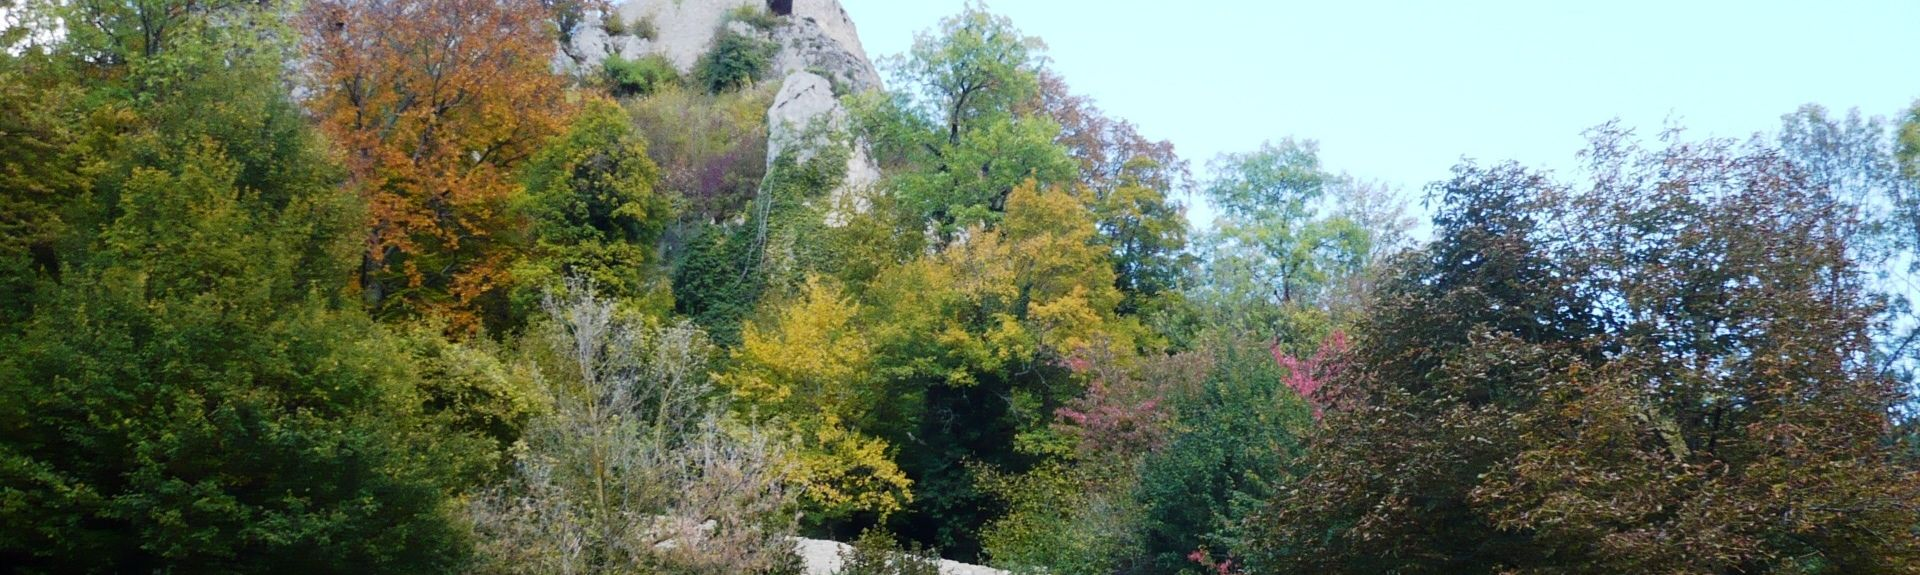 Ferrette, Alsace-Champagne-Ardenne-Lorraine, France